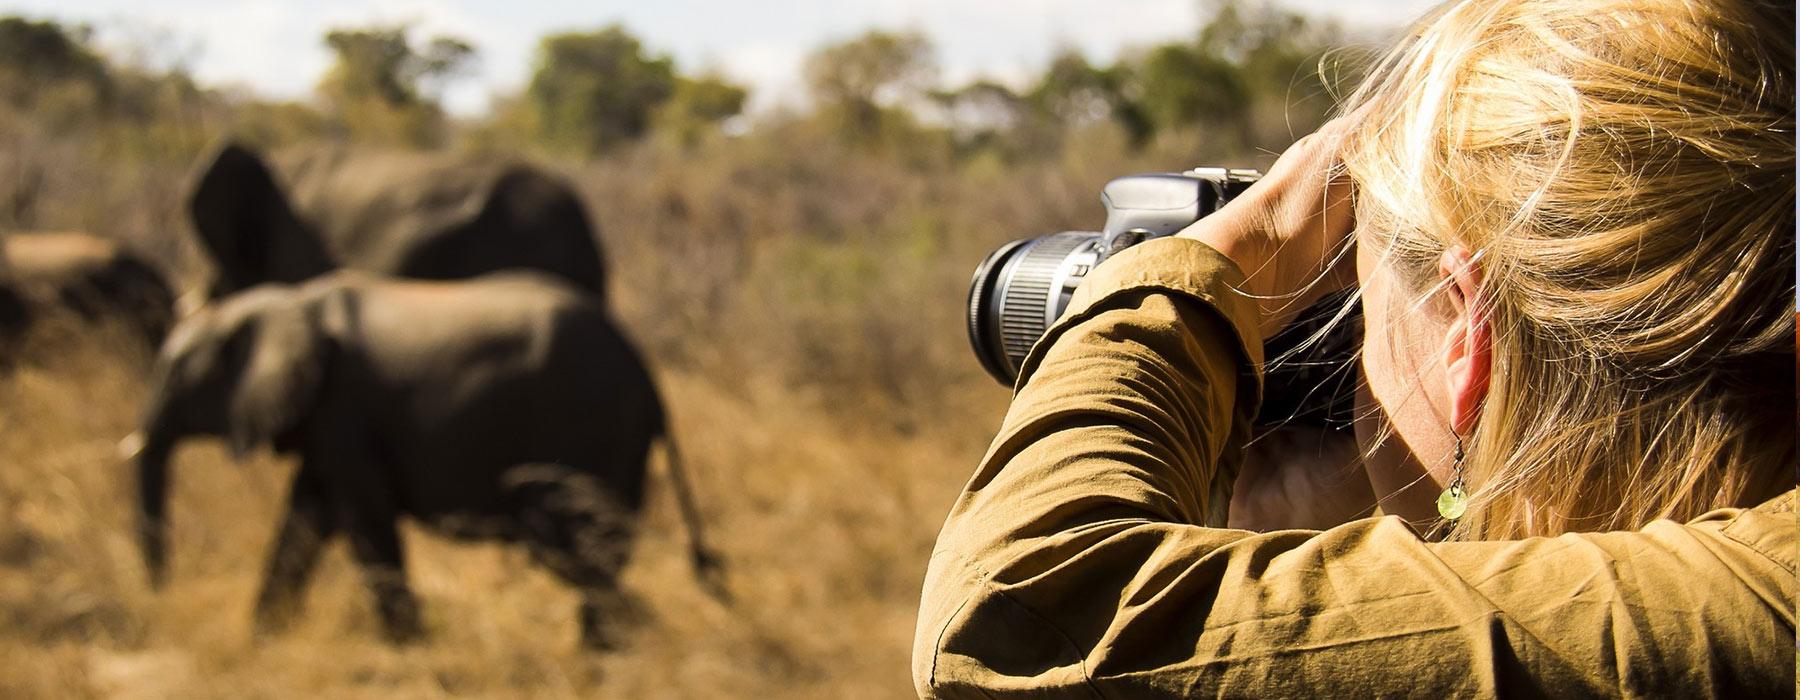 Tanzania Photography